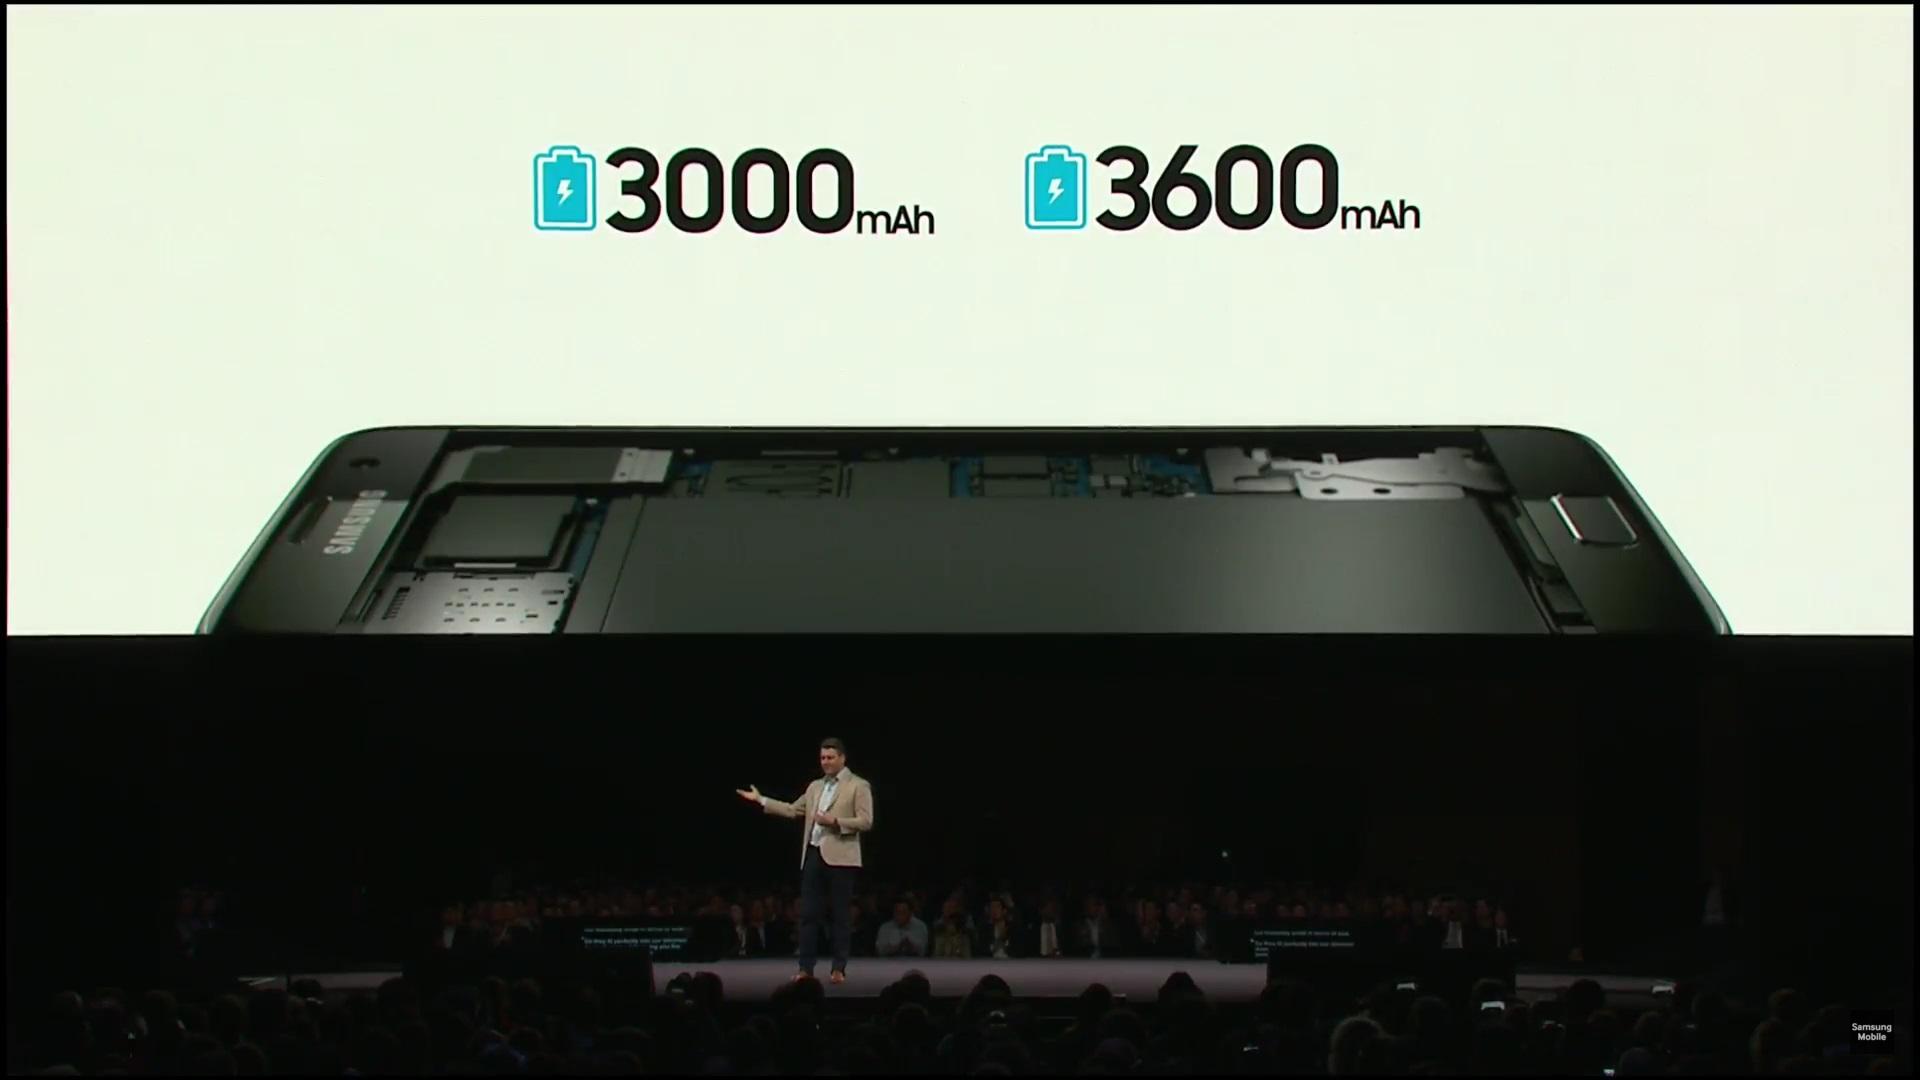 Samsung S7 bateria